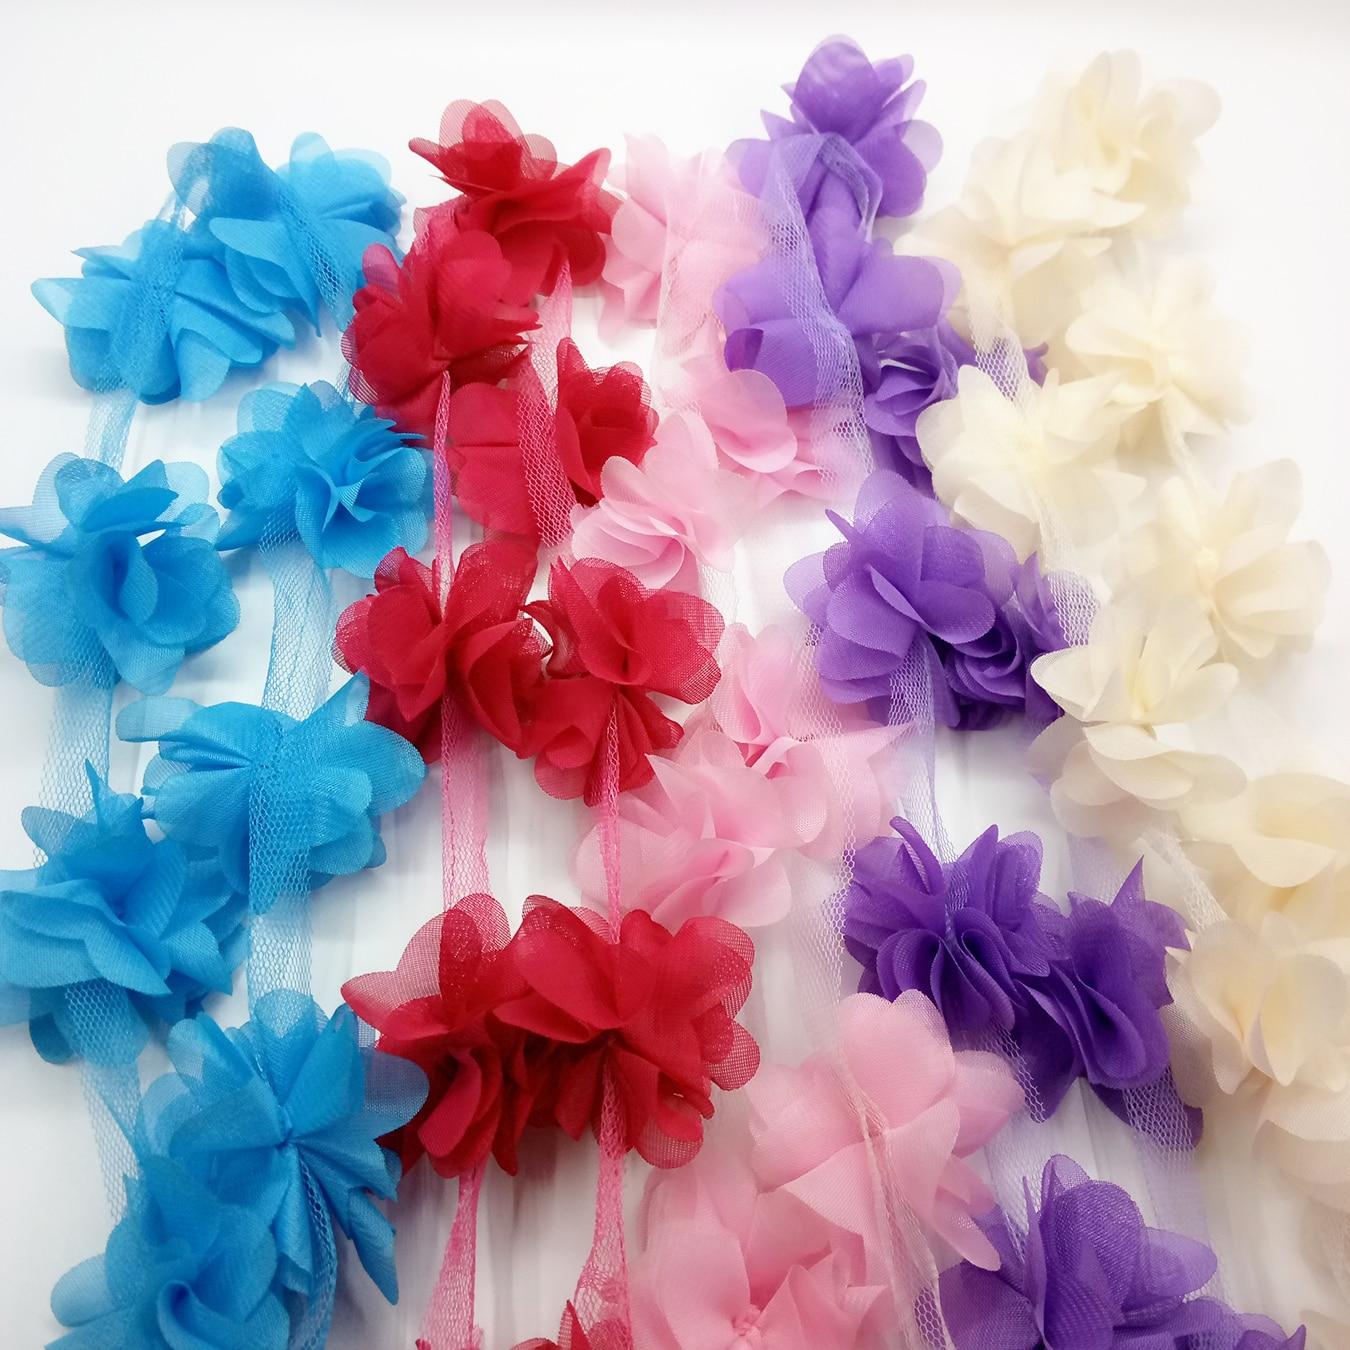 Fabric Flower Trim: Aliexpress.com : Buy 4 Yards New Fringe Lace Ribbon Trim